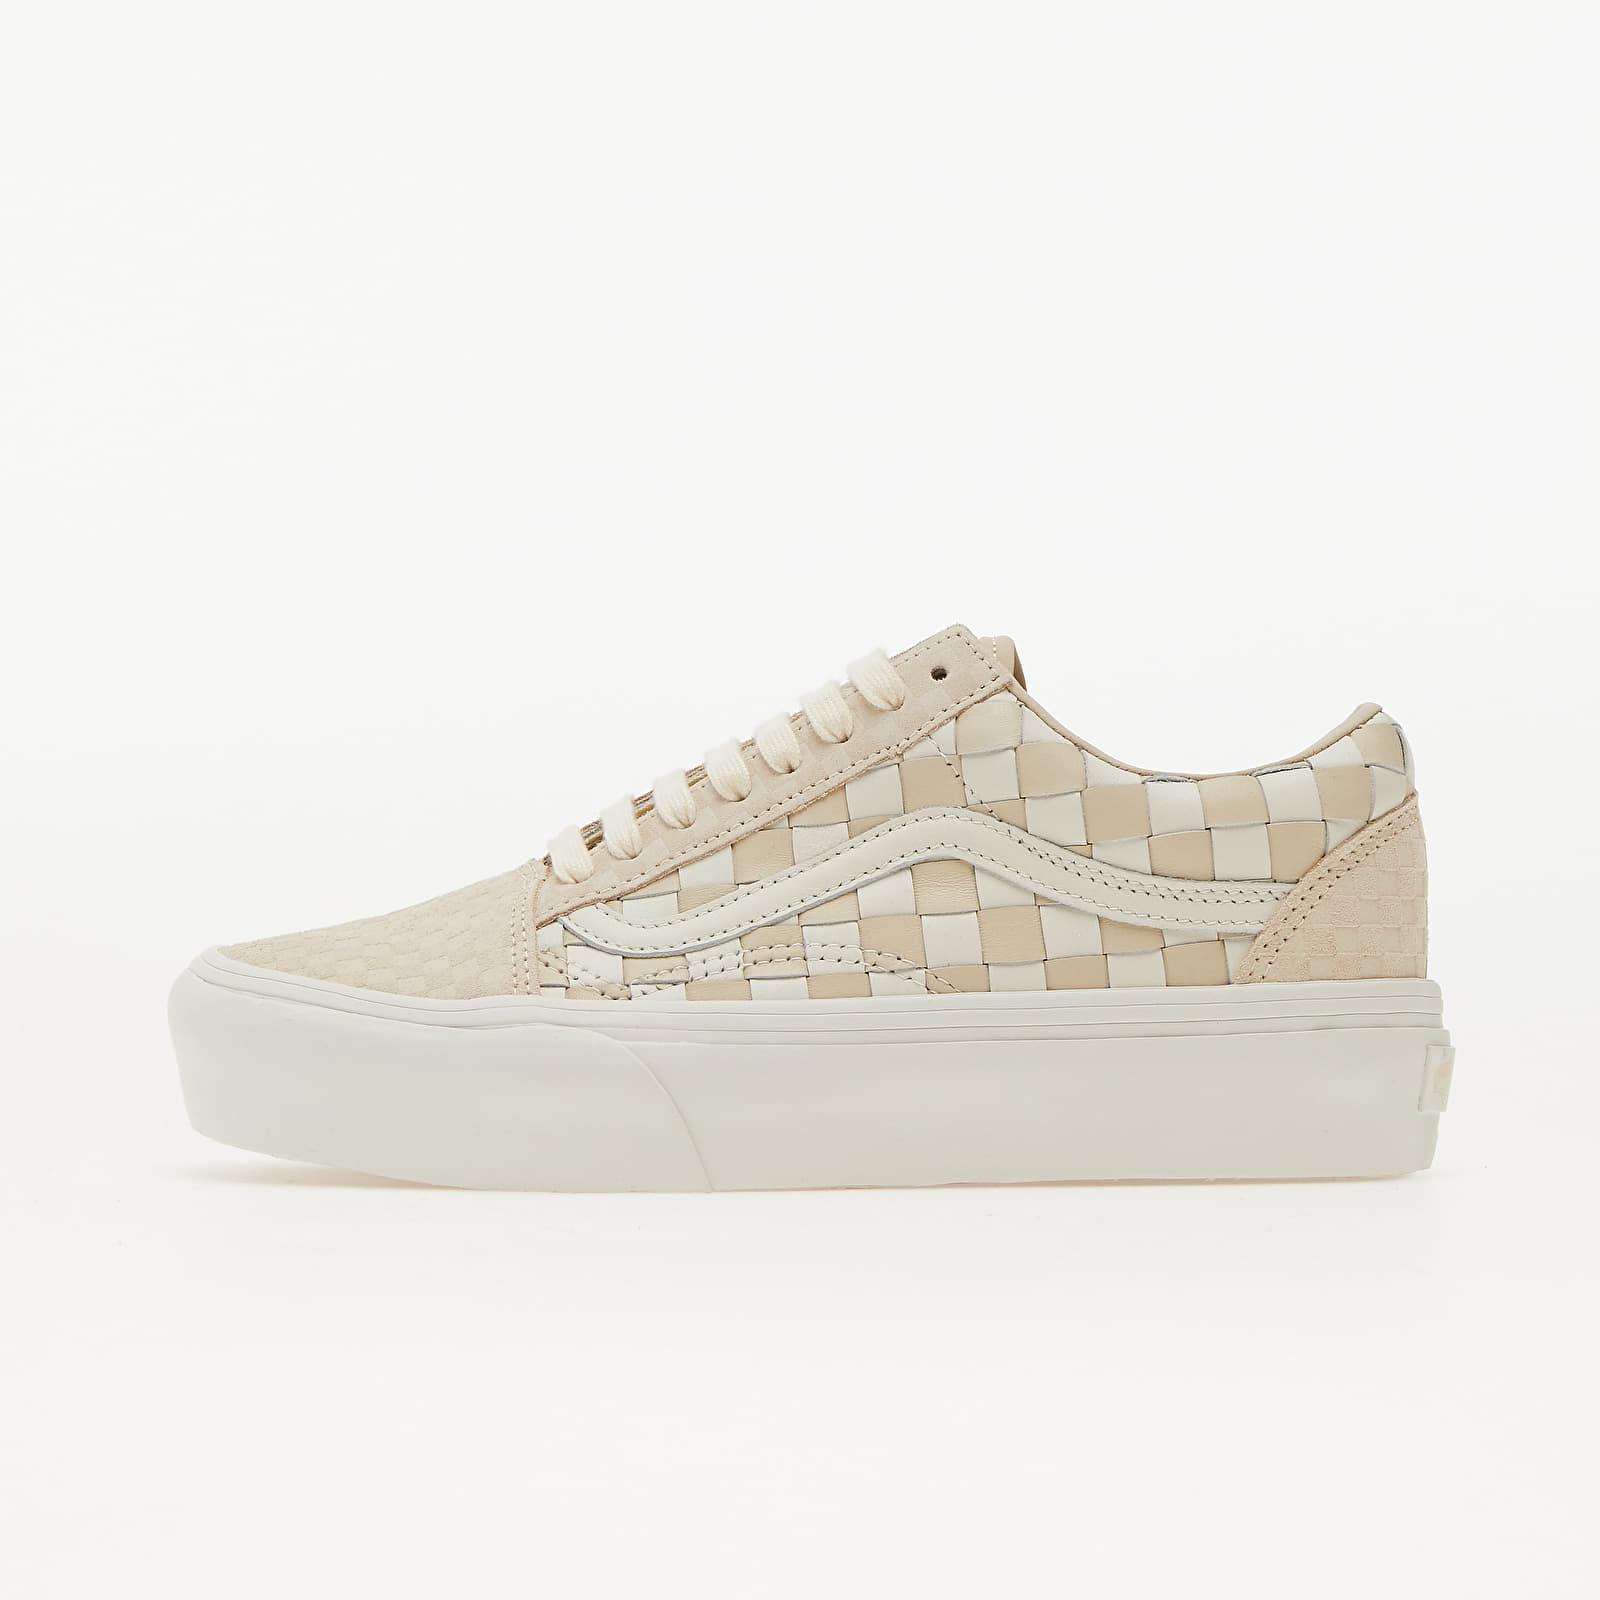 Vans Old Skool Platform (Wowen Leather) White/ Cream EUR 39